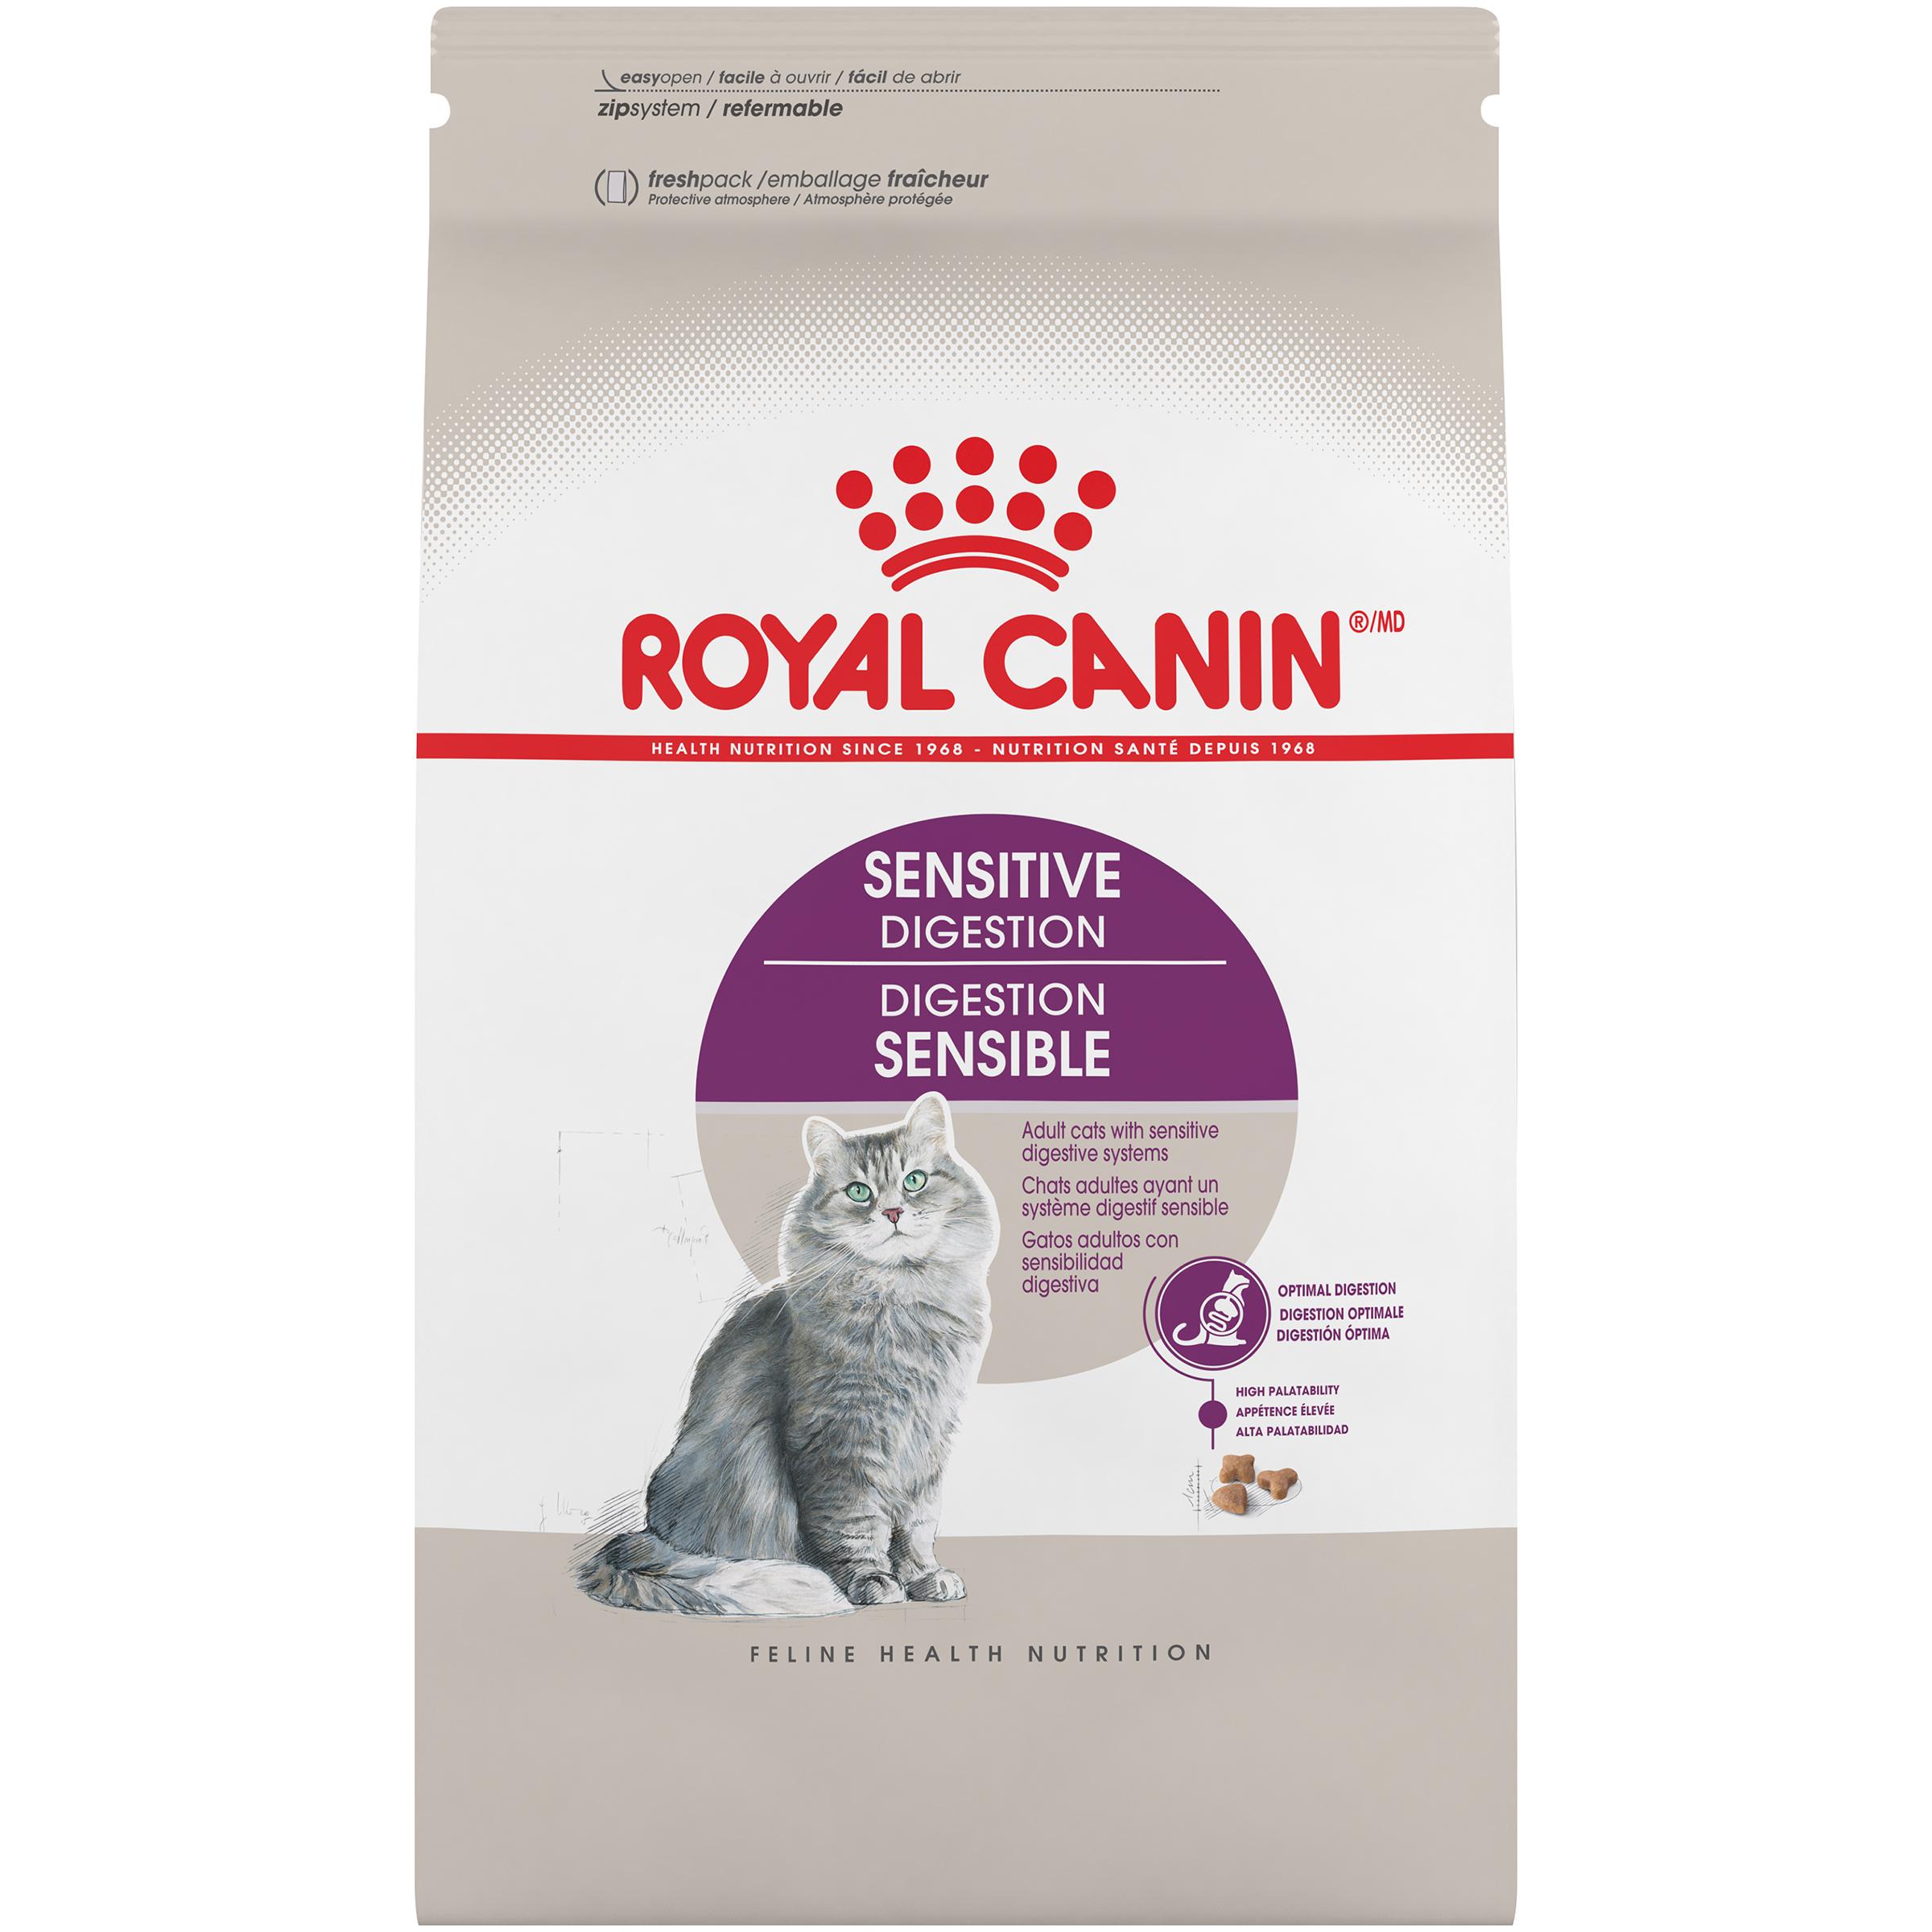 Royal Canin Sensitive Digestion Dry Cat Food, 3.5 lb